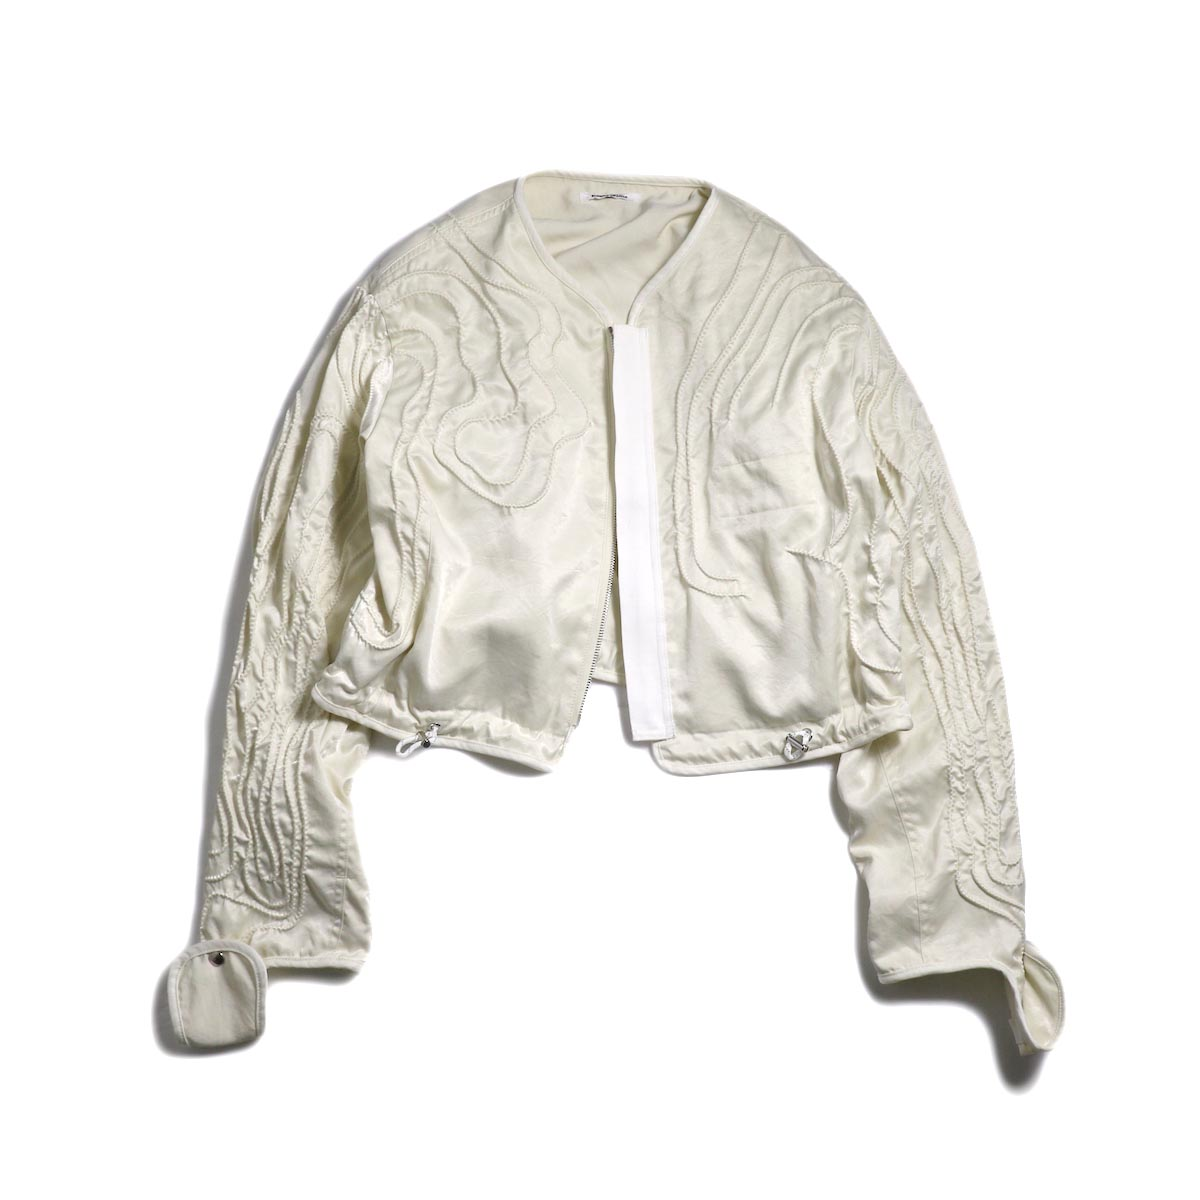 FUMIKA UCHIDA / Poli Cord Parachute Blouson -White